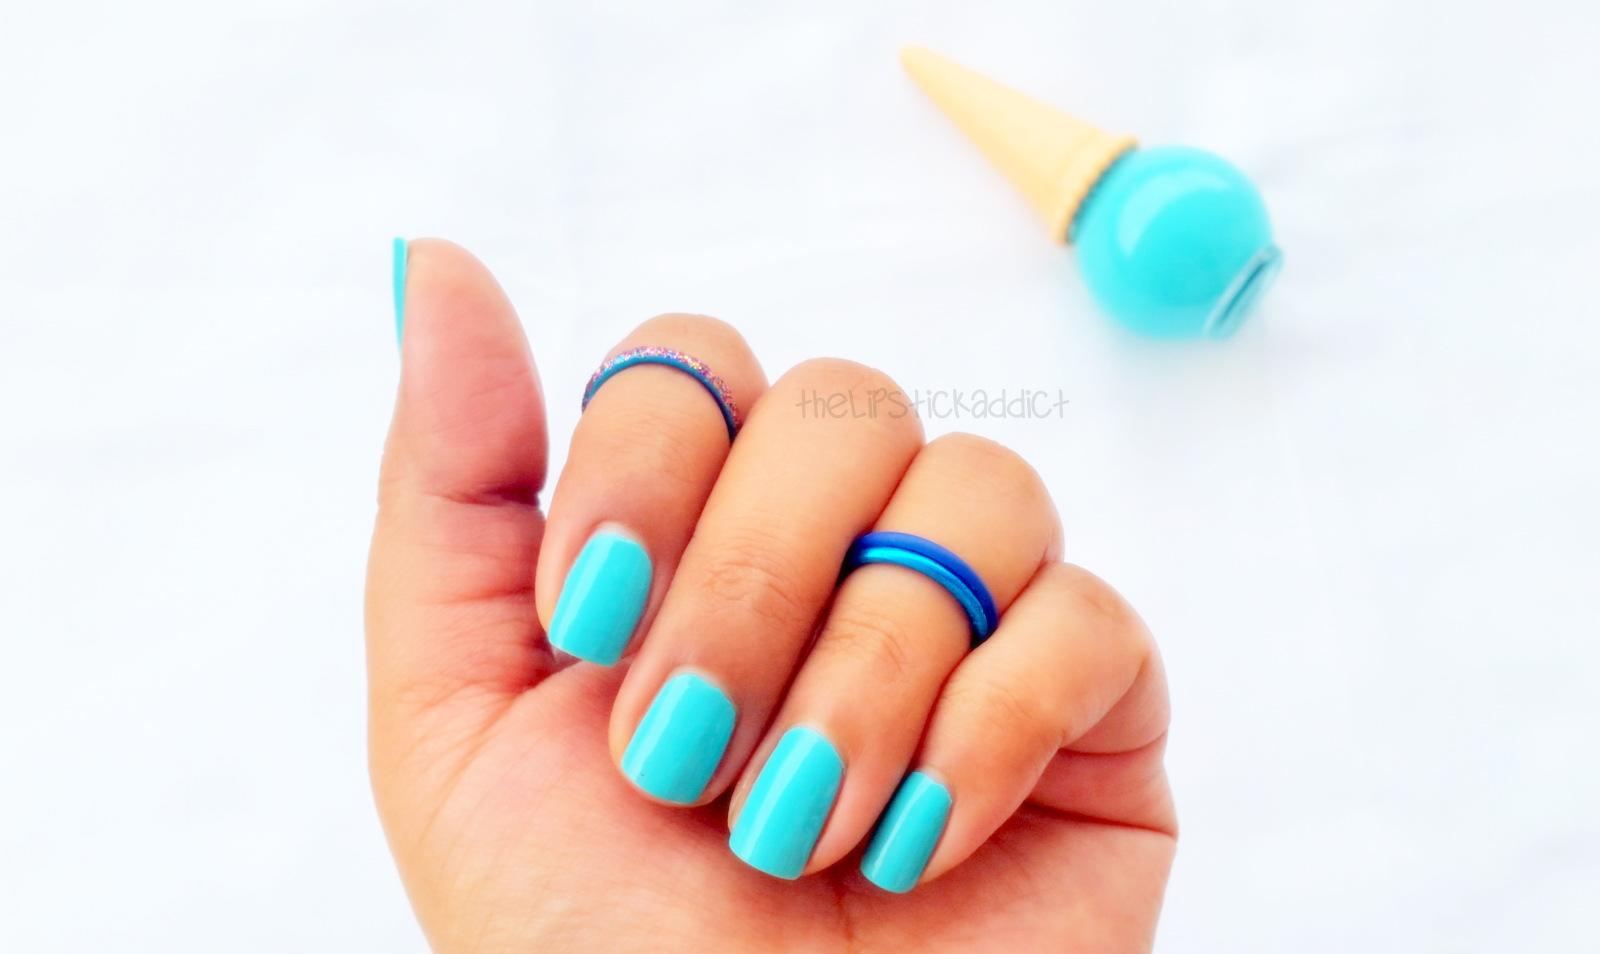 Etude House IceCream Nails Polish in Blue Mint